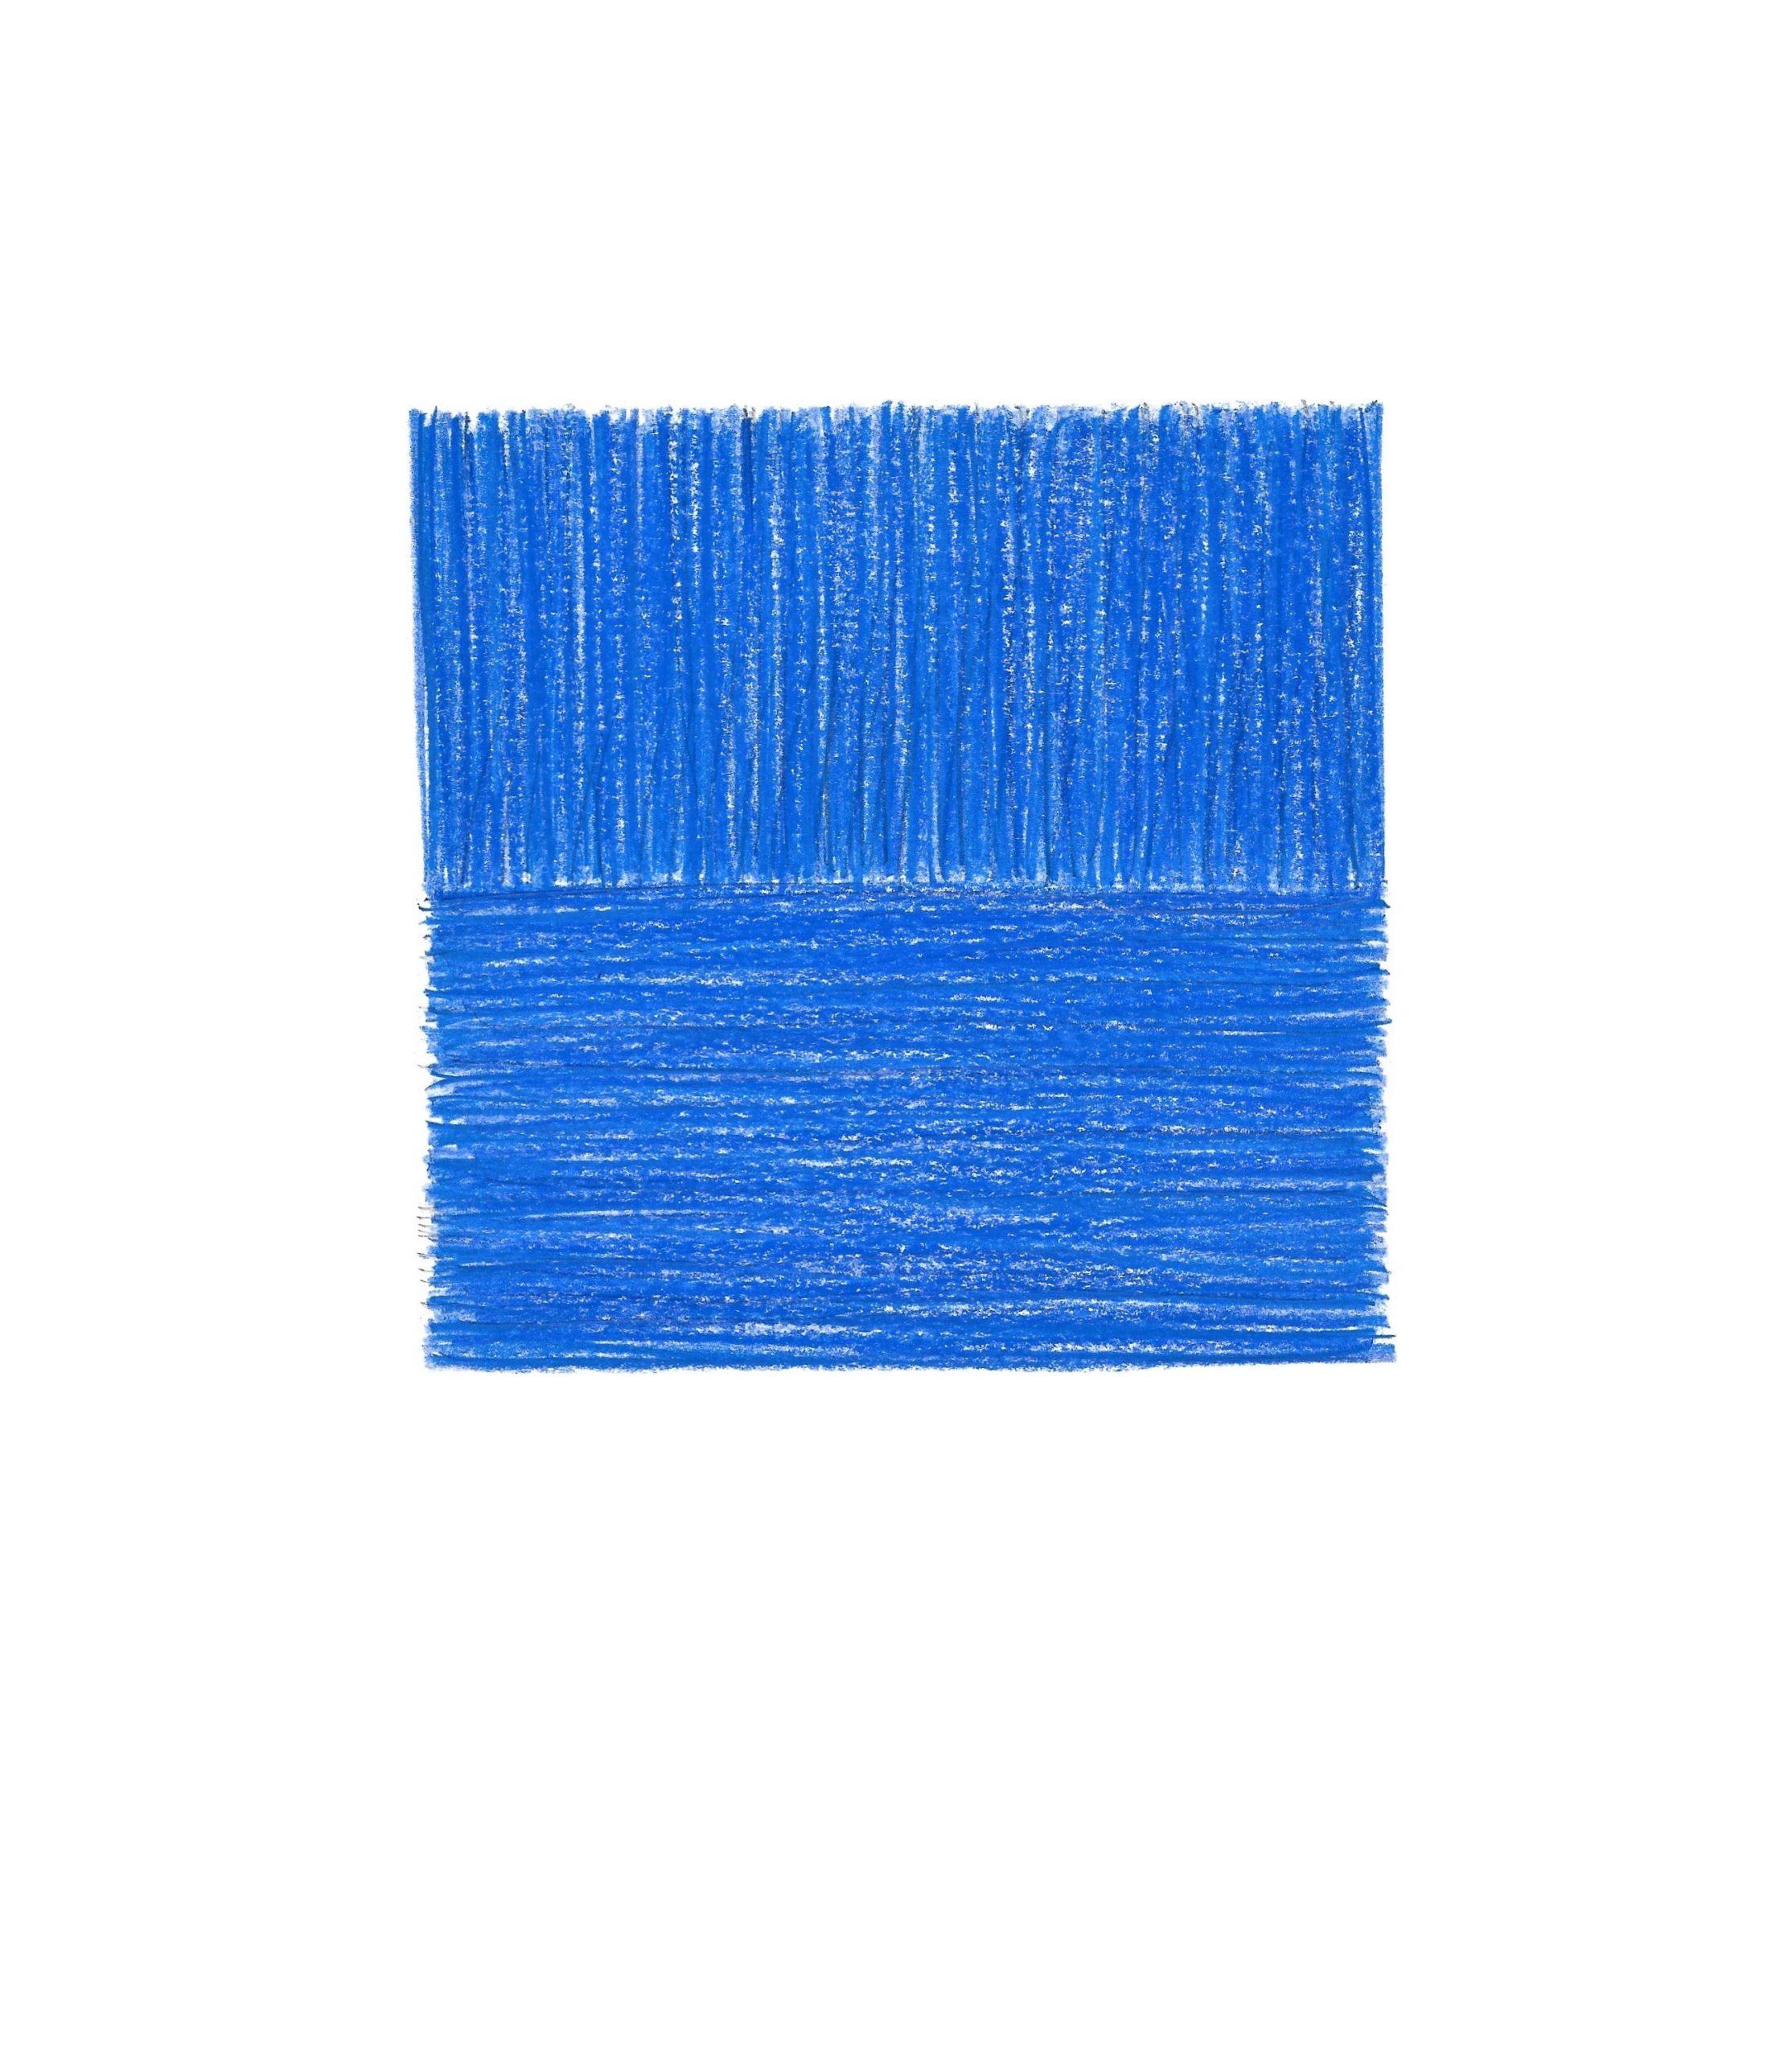 Tineke Porck – Binary square blue